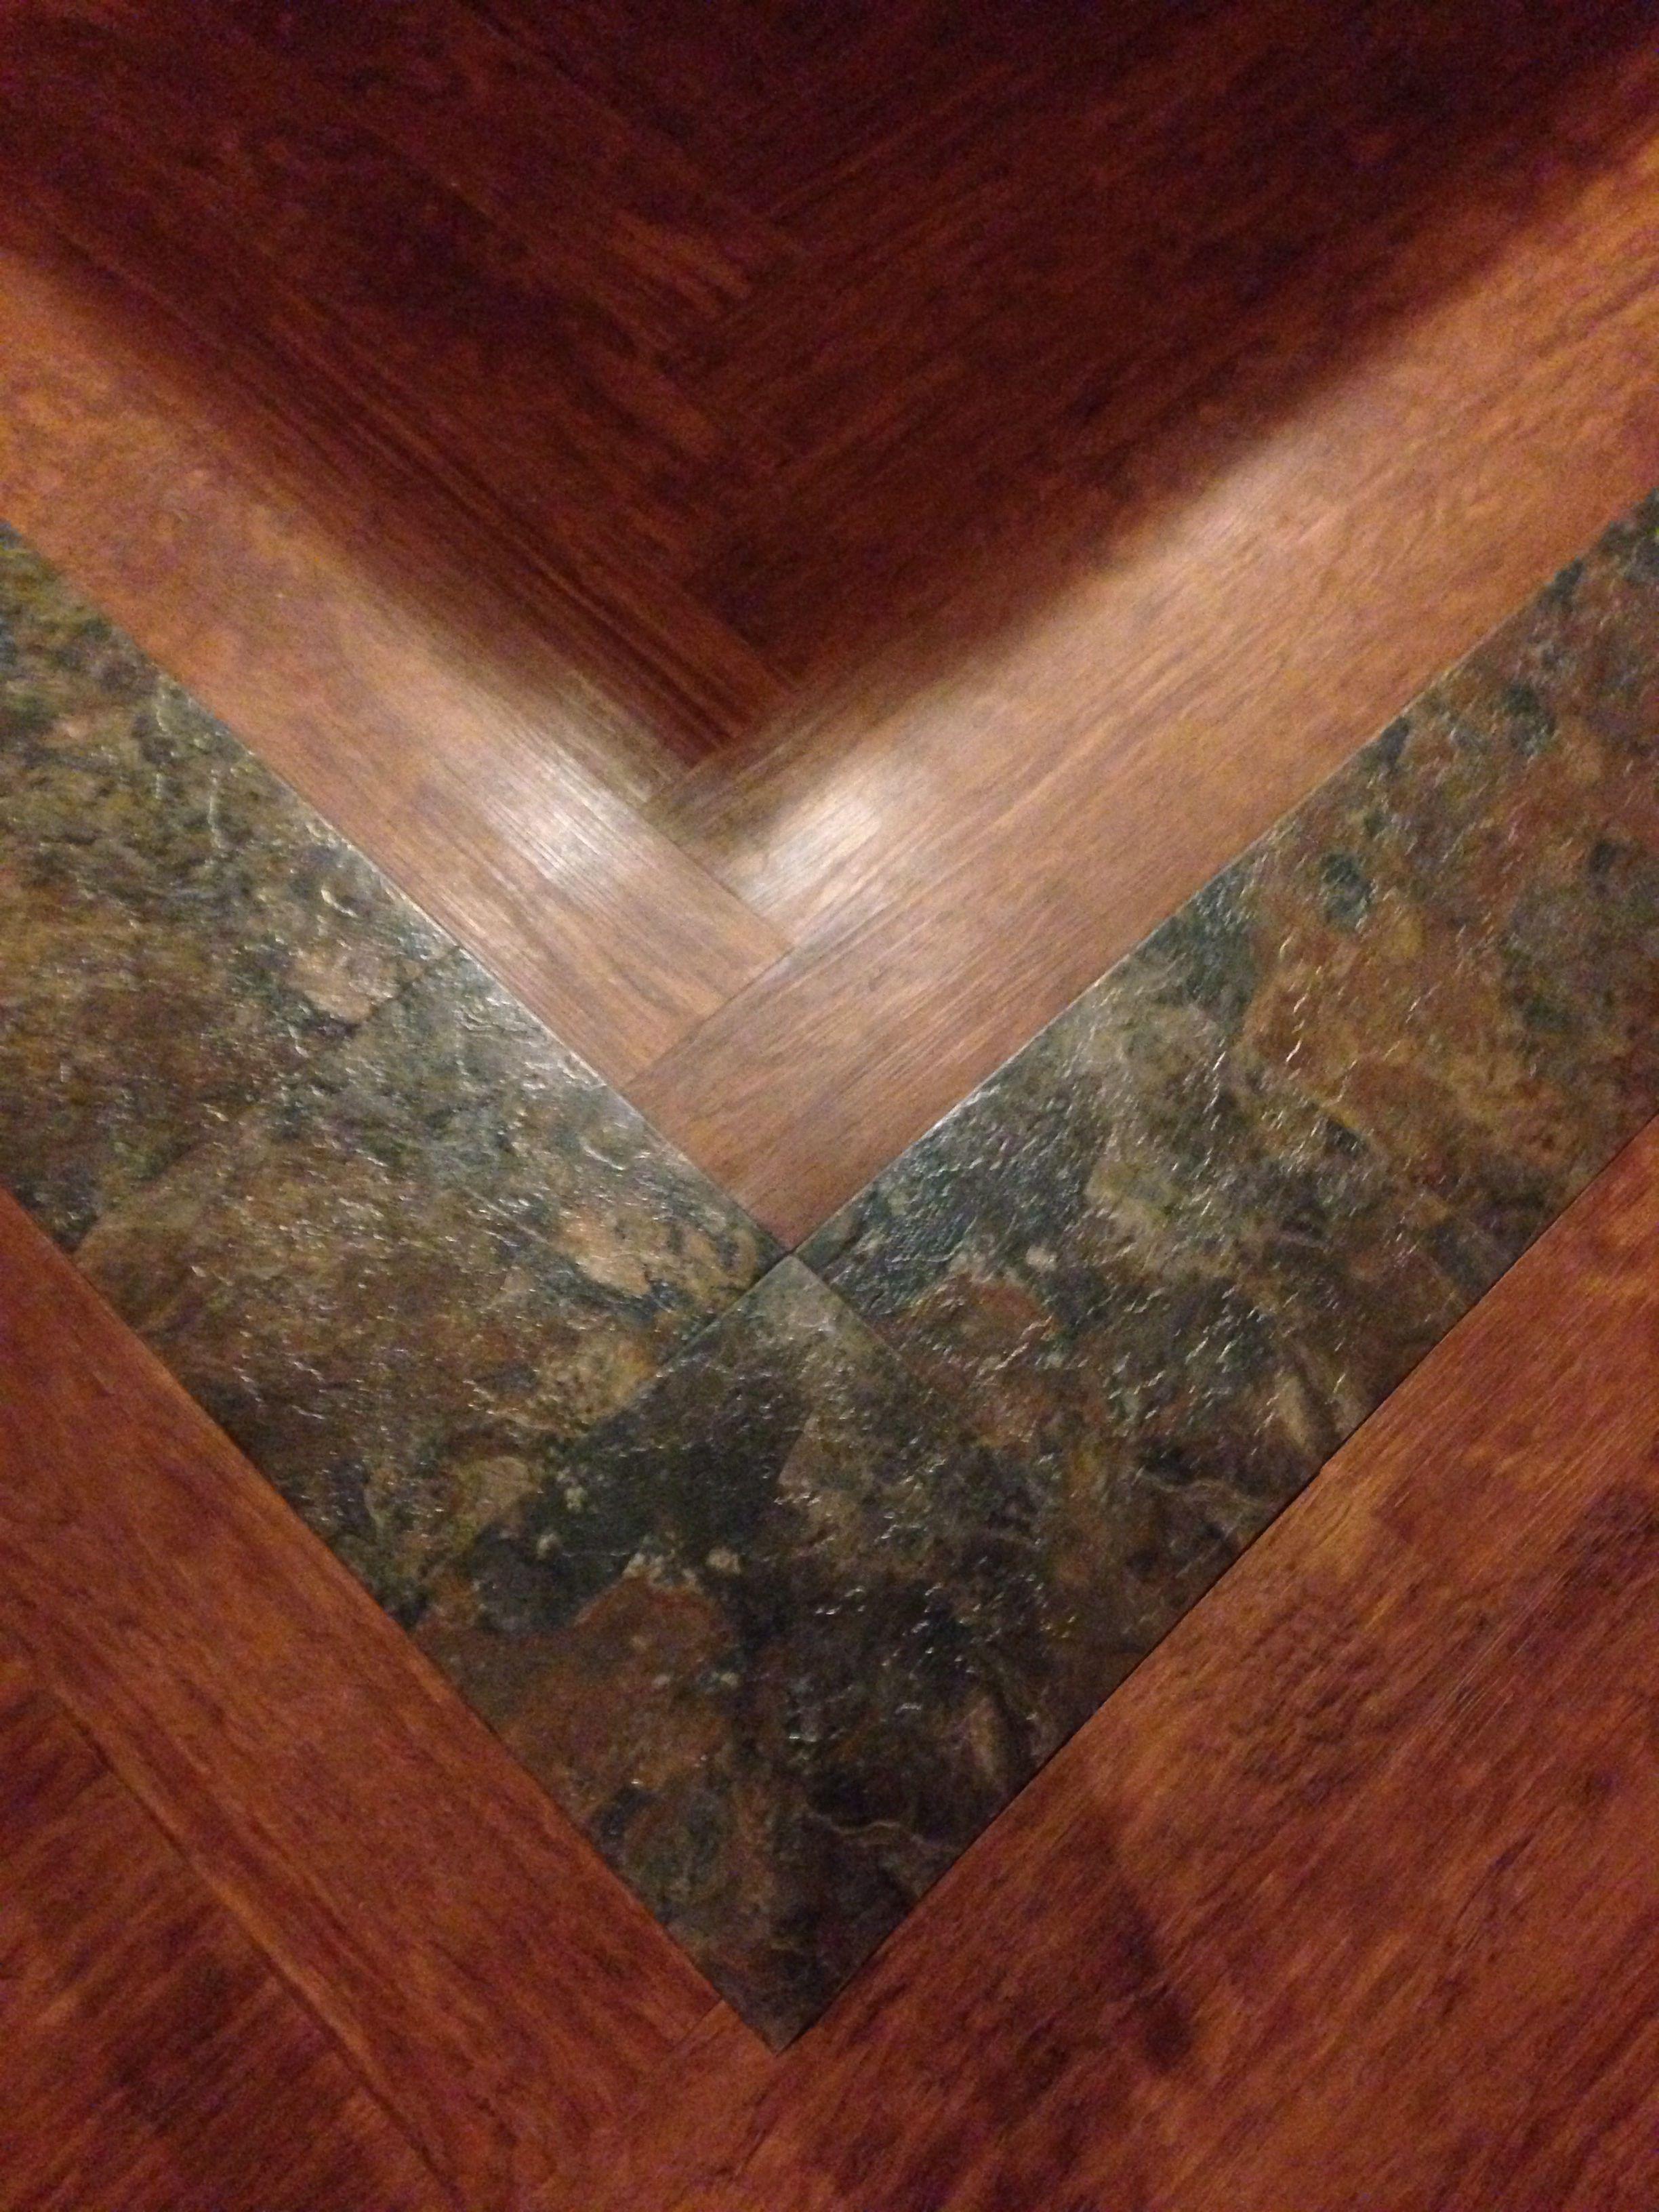 Vinyl plank flooring with inlay and pattern   Pinterest   Plank ...